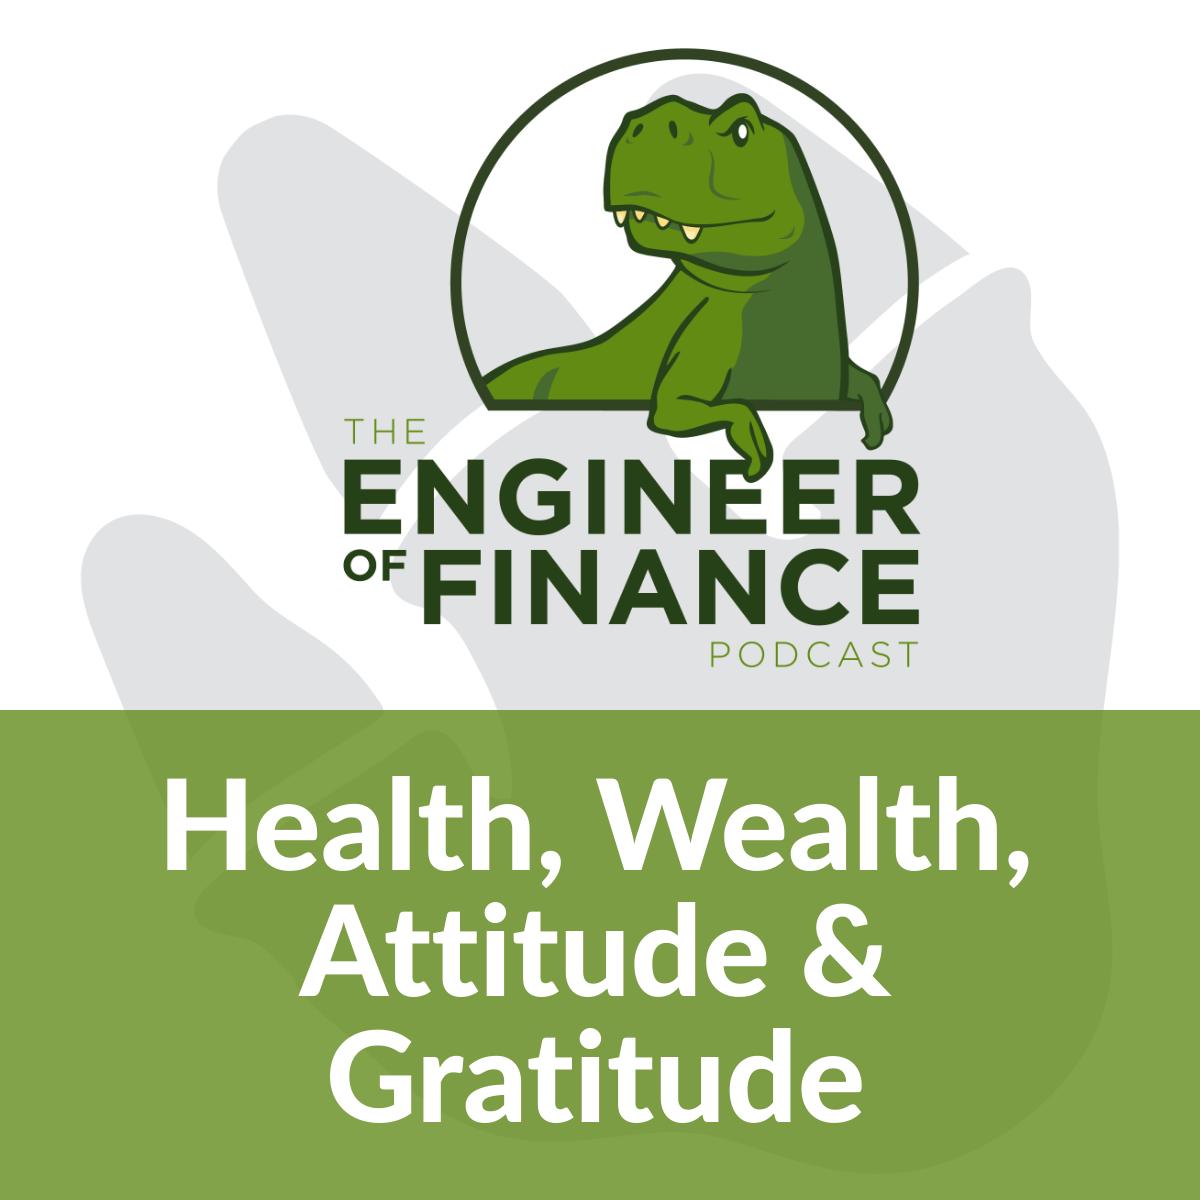 Health, Wealth, Attitude & Gratitude – Episode 151